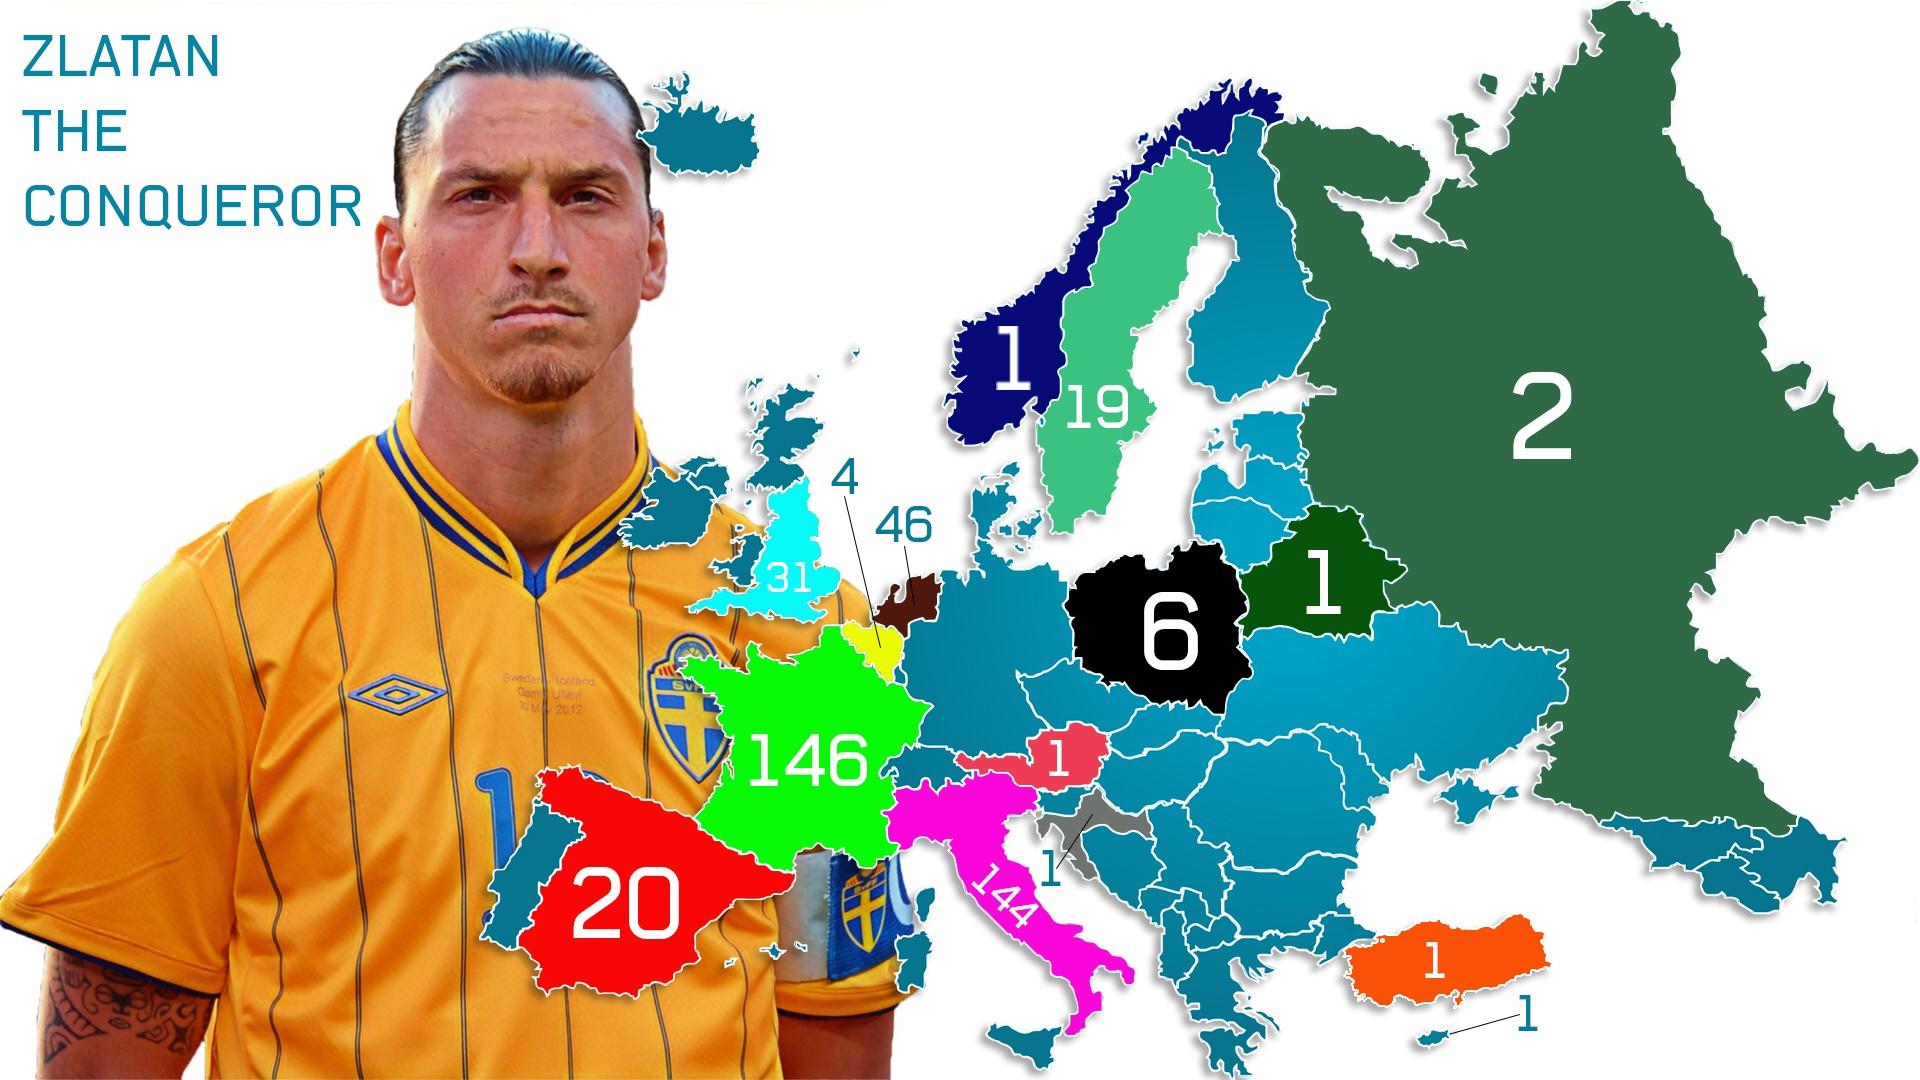 https://i.eurosport.com/2018/05/09/2330869.jpg